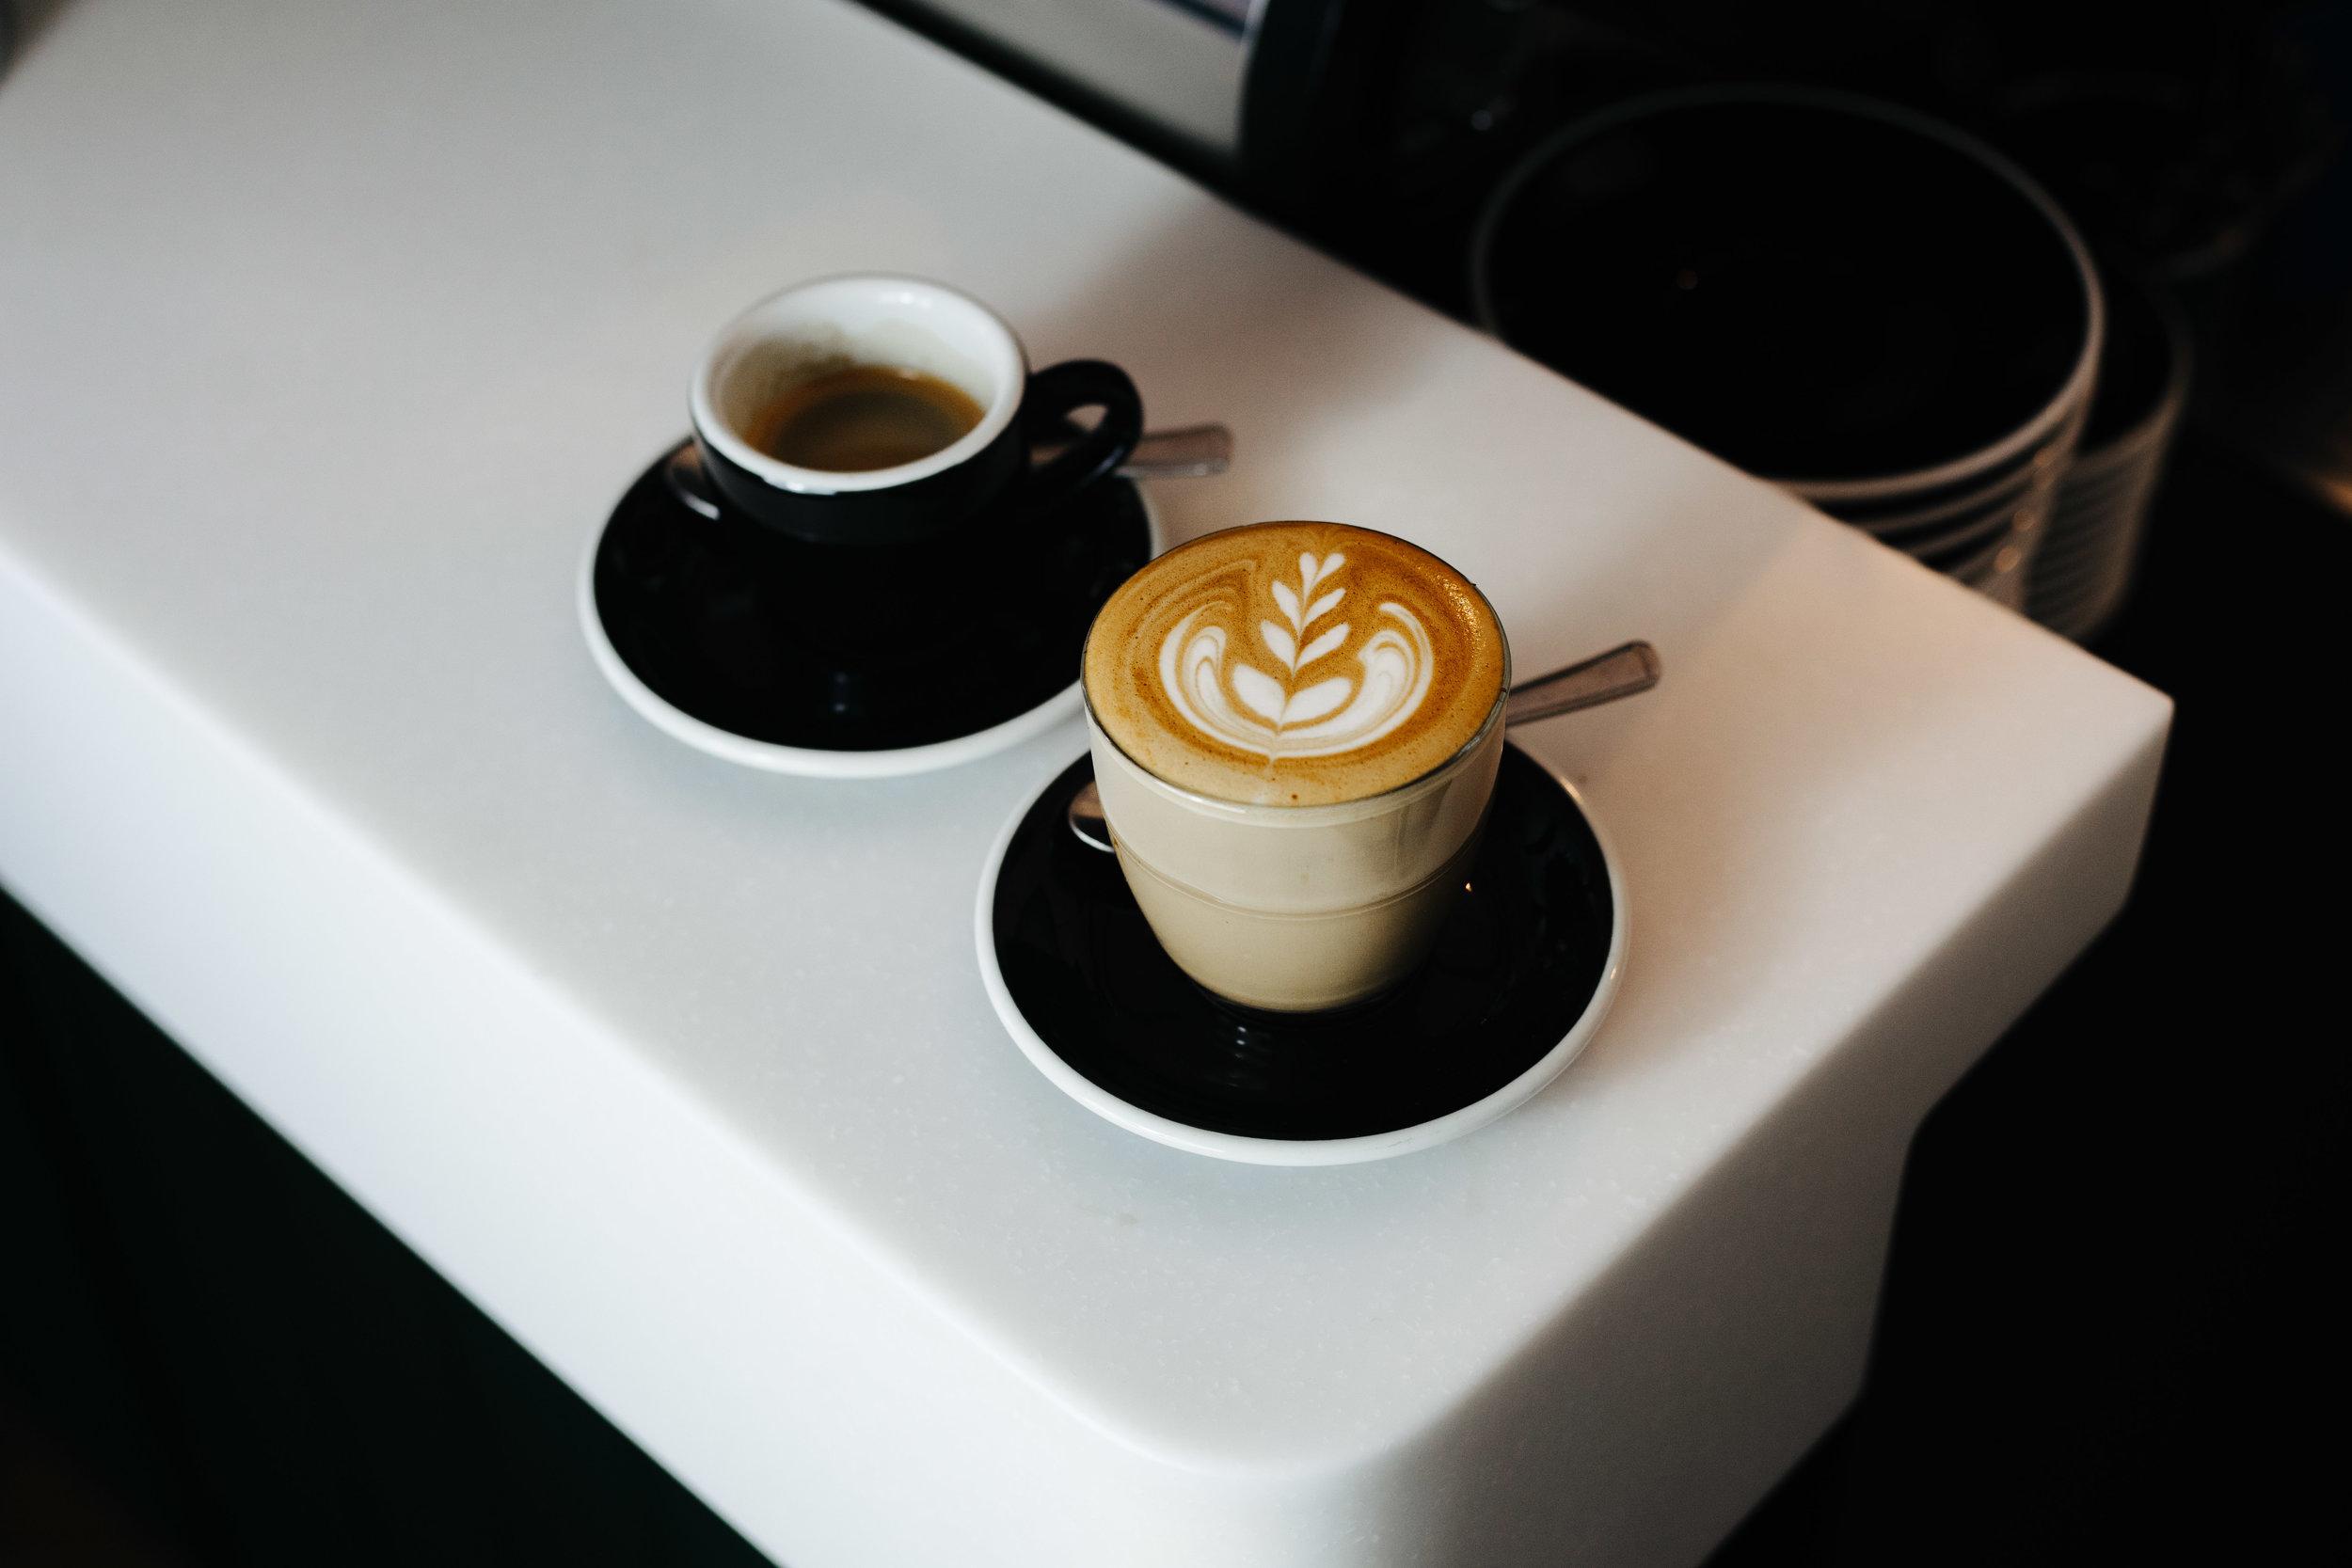 Specialty_Coffee_Flat_white_Espresso